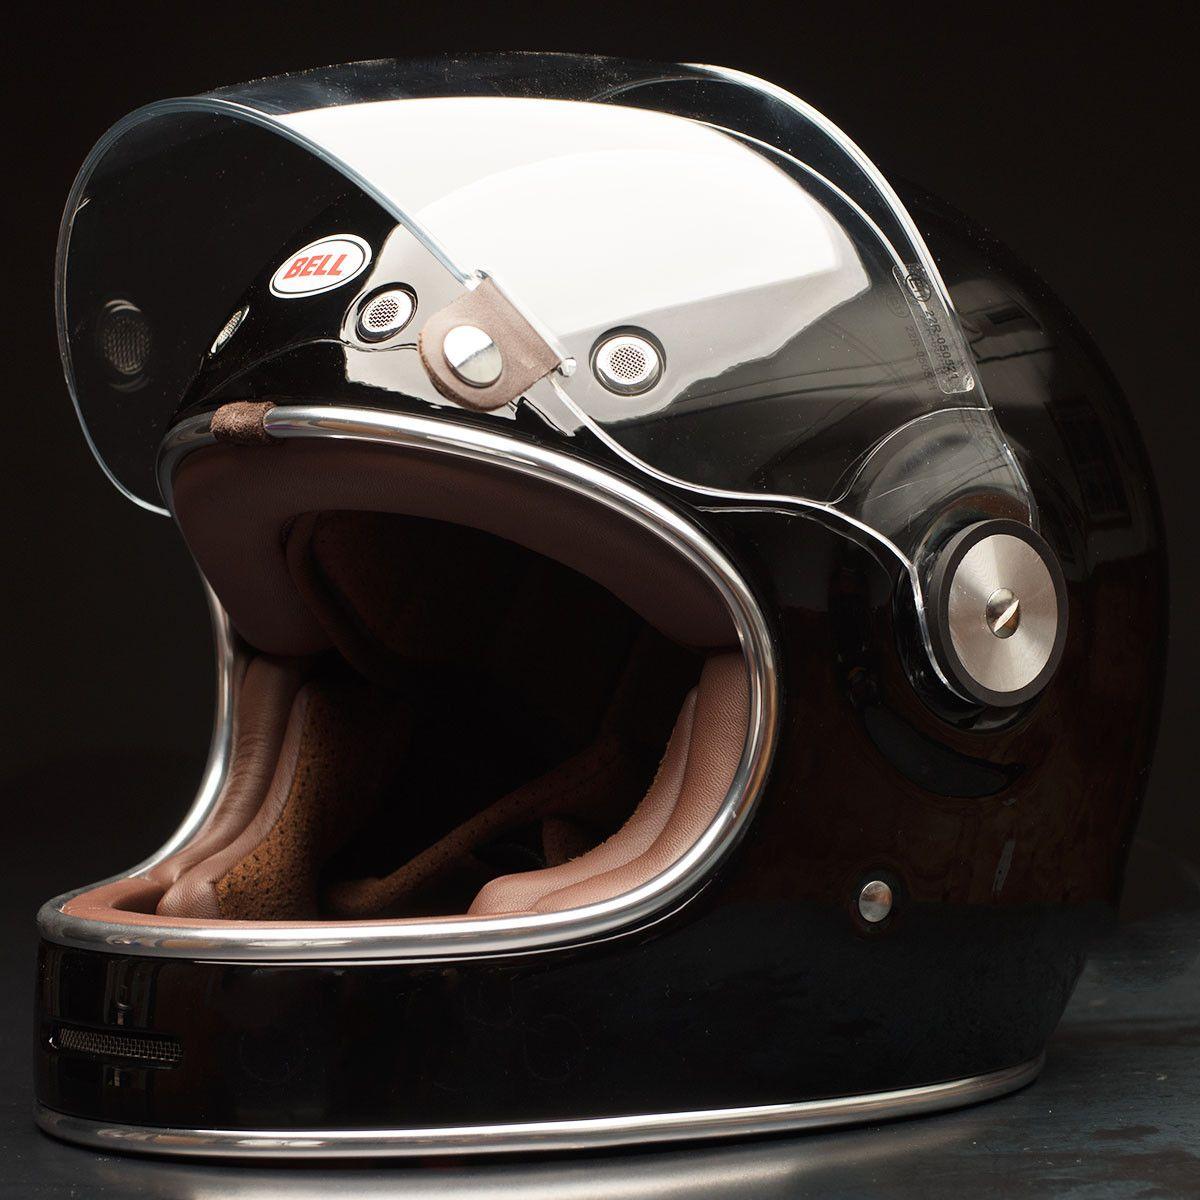 "30ac166f ART HELMET on Instagram: ""🏁 caferacer.arts 🏁 Helmet Vintage M50 Glossy  With Visor. Motorcycle Gear Pre Order Custom Info Order👇👇👇 WA :  +6285222225861 ..."